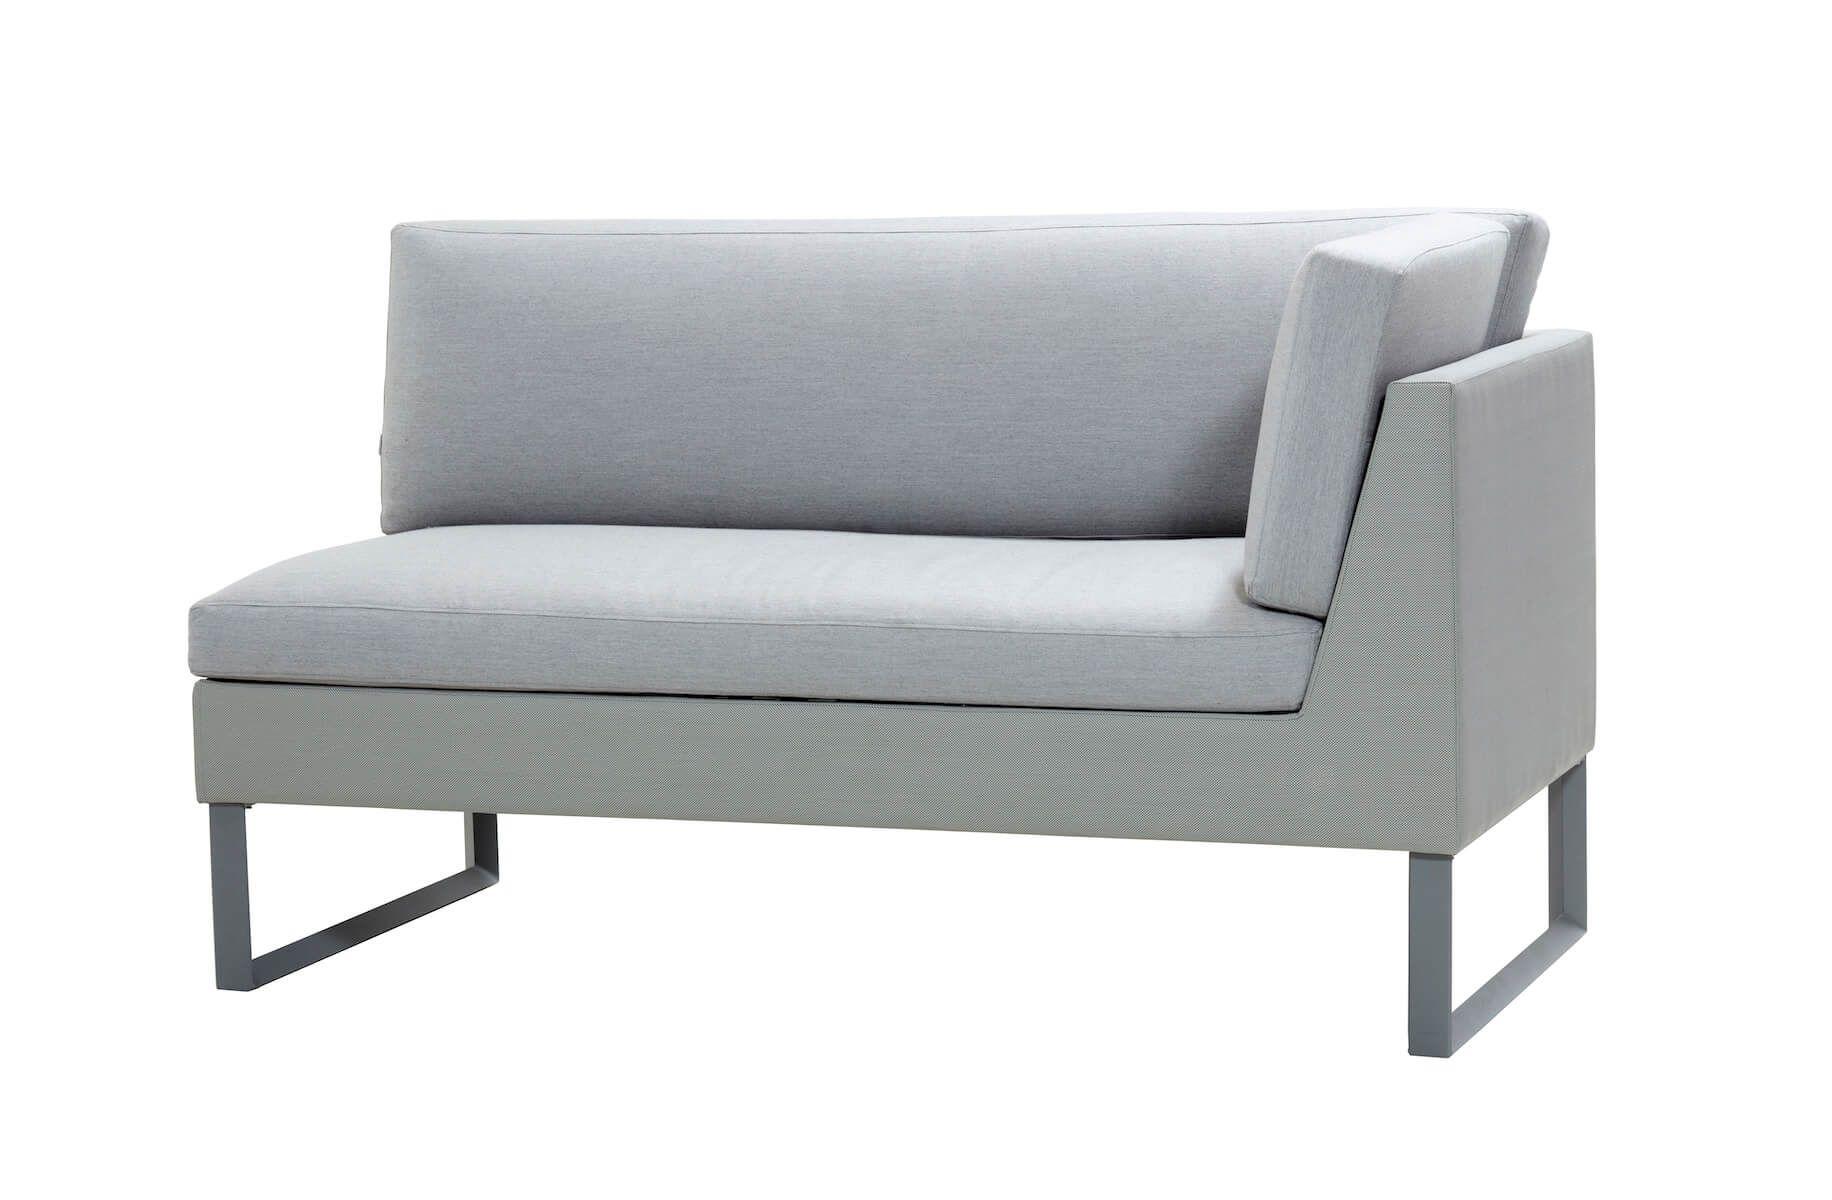 Full Size of 2 Sitzer Sofa Cane Line Fle2 Ligne Roset U Form Polyrattan Garnitur Teilig Schlafsofa Liegefläche 160x200 In L Bett 140 X 200 Ektorp Mit Stauraum 140x200 Sofa 2 Sitzer Sofa